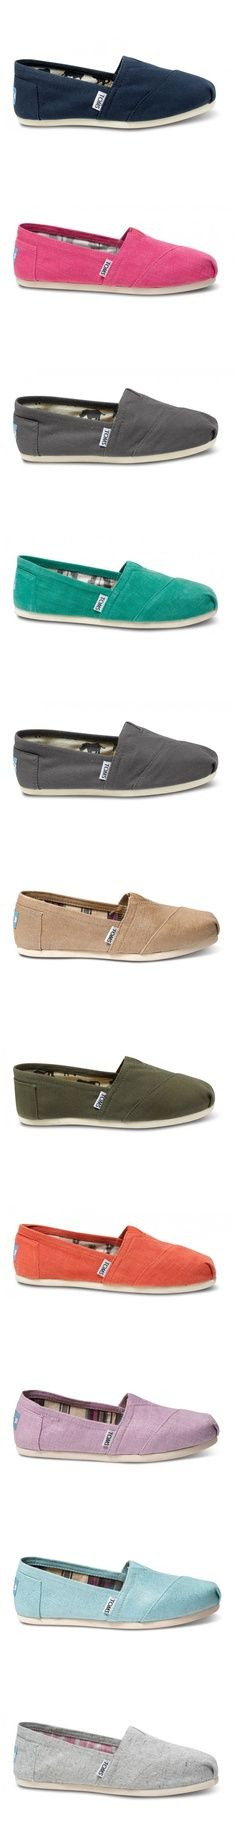 Woman's fashion /Toms Shoes Outlet